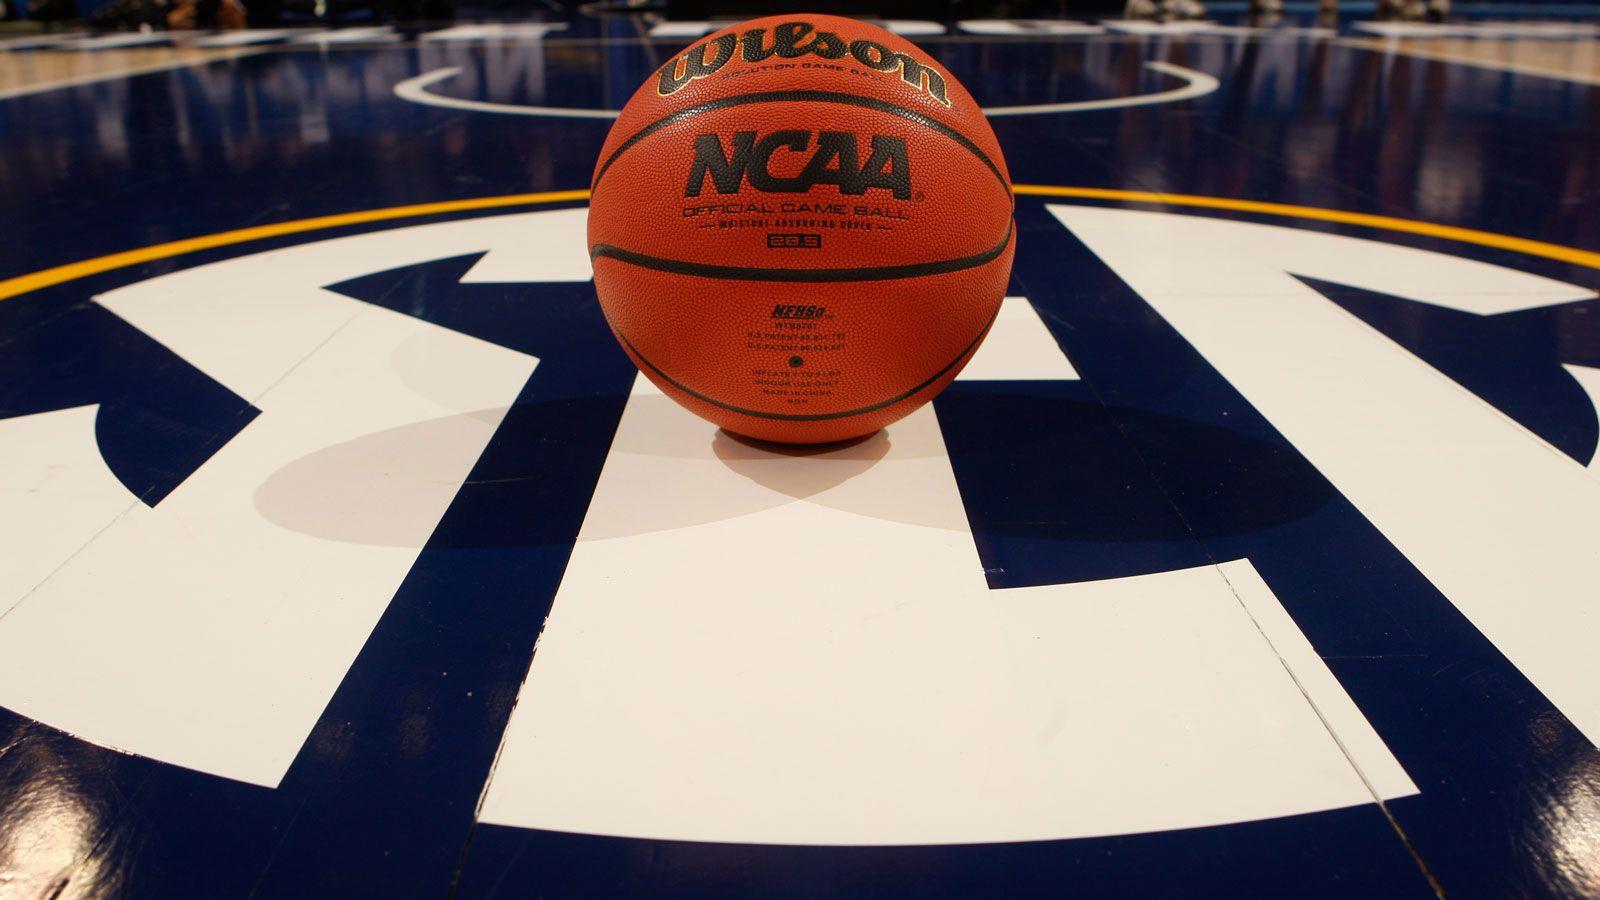 SEC Men's Basketball Video Conferences